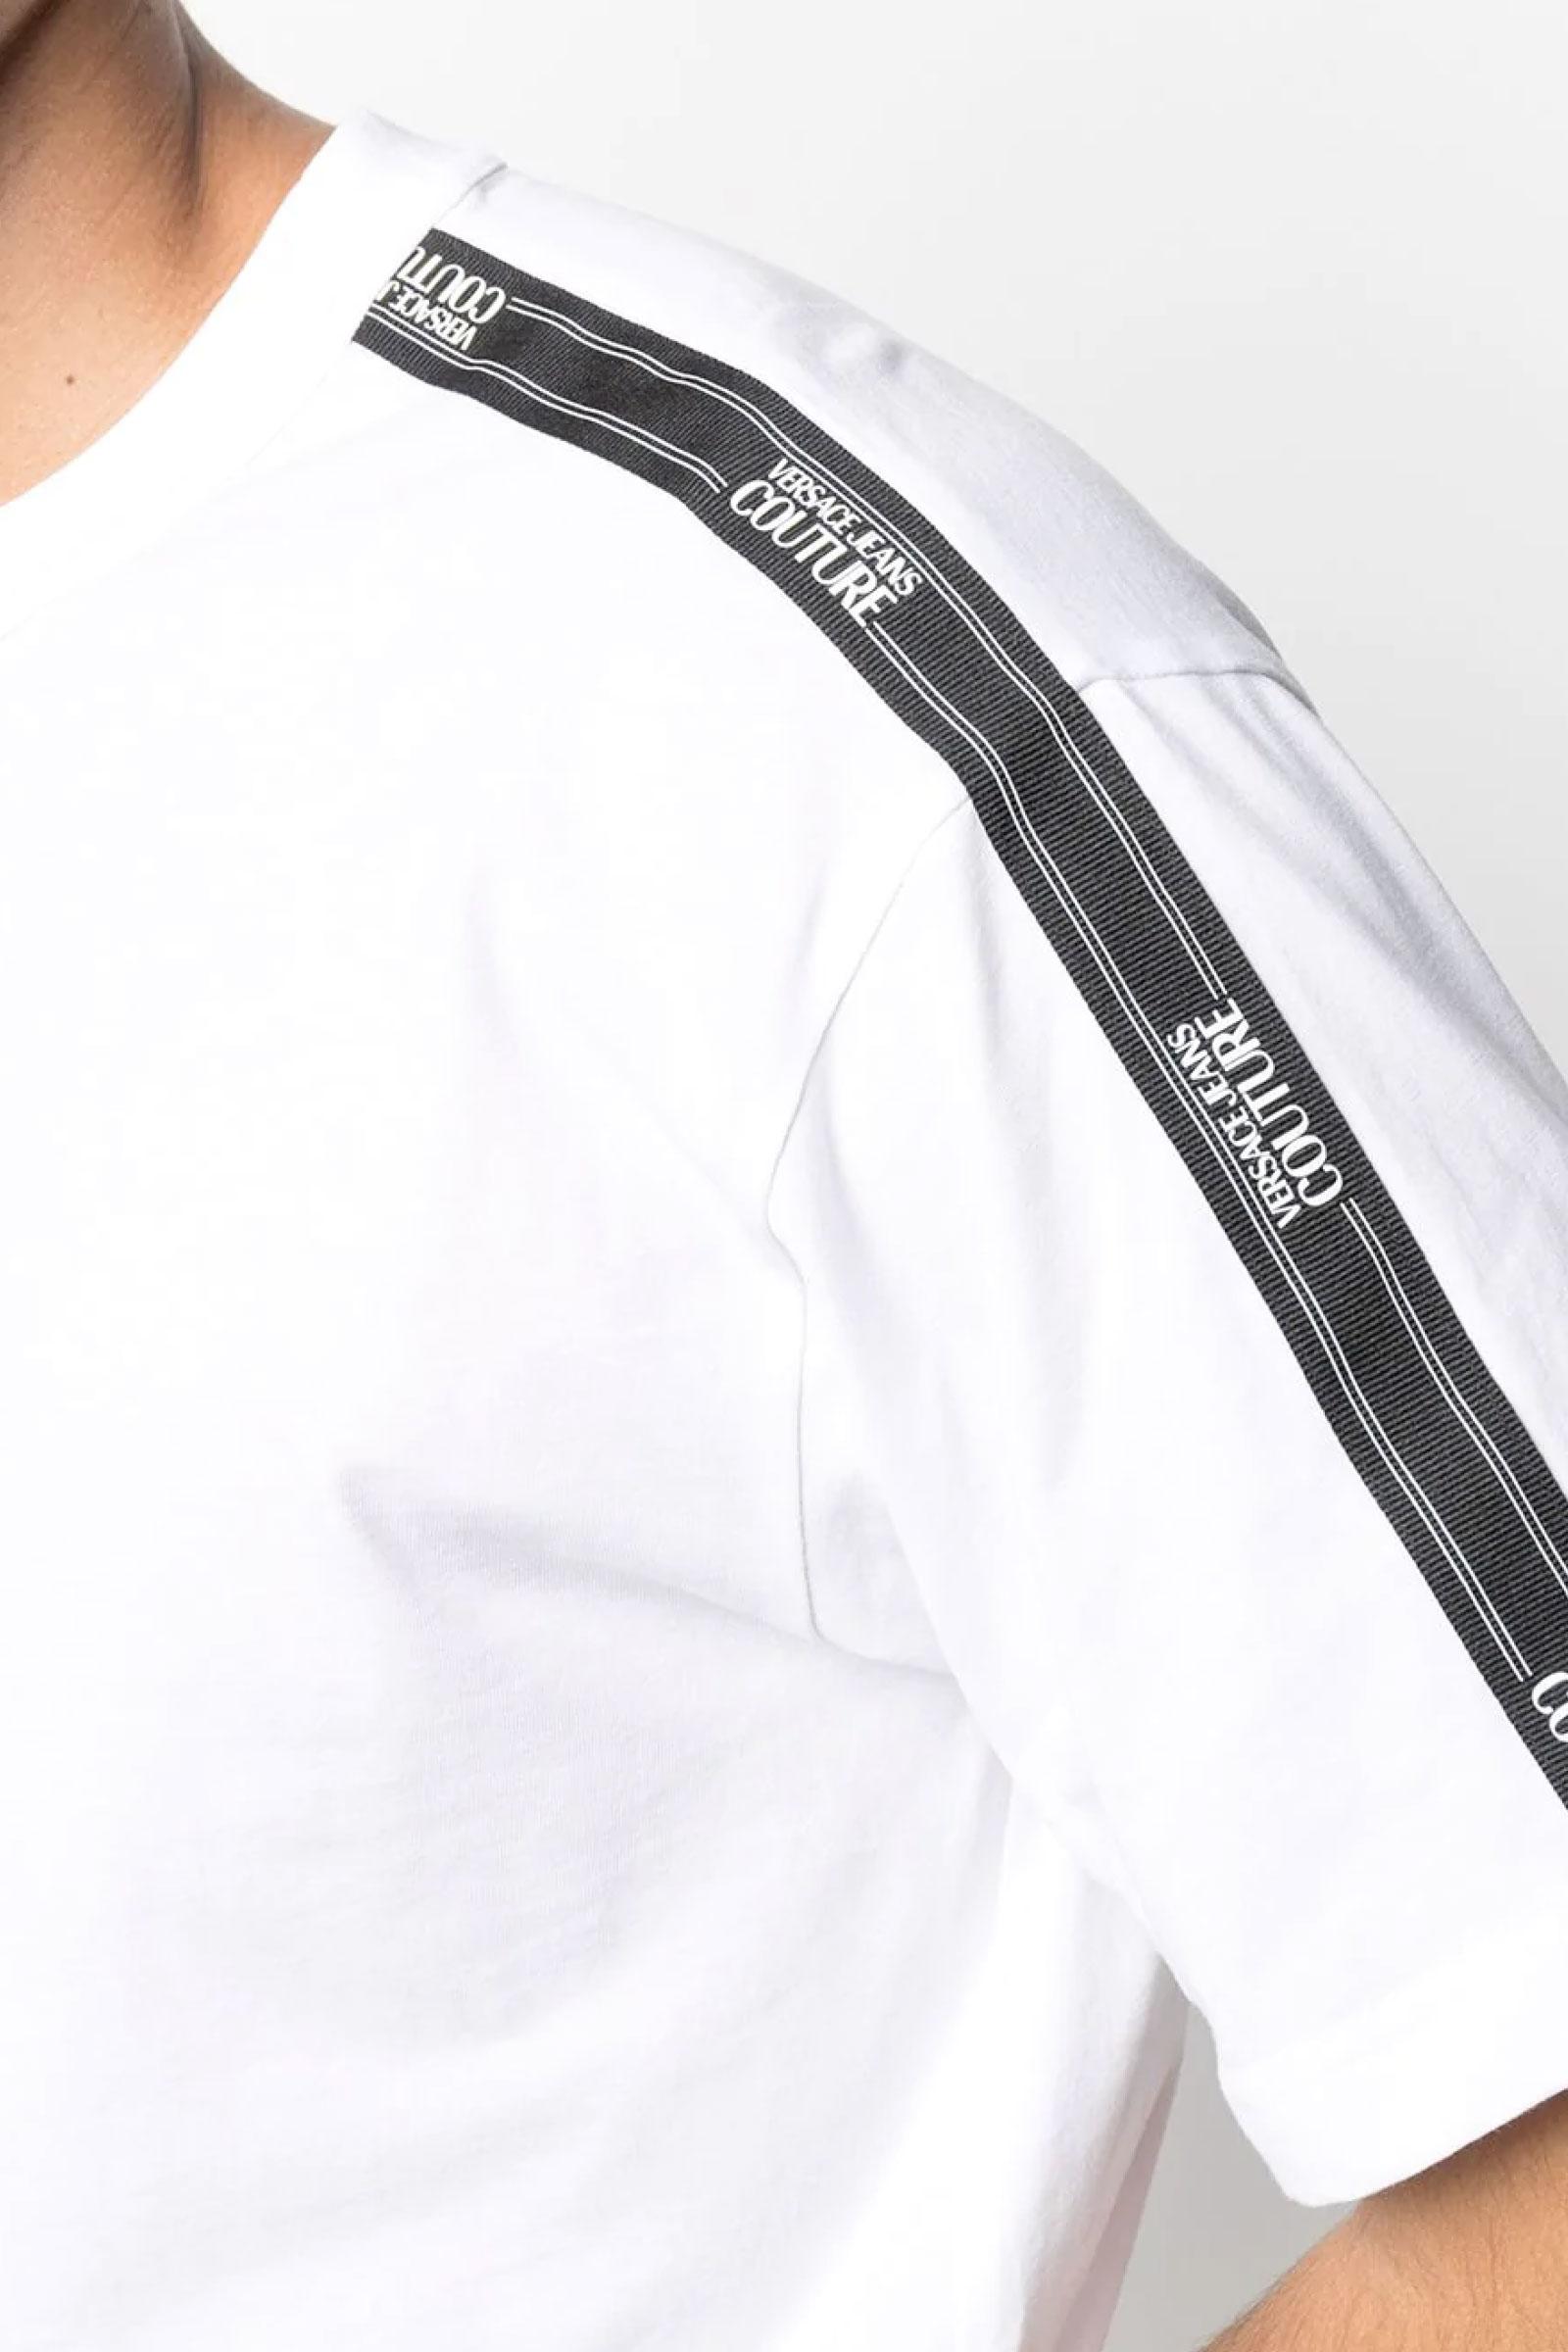 VERSACE JEANS COUTURE Men's T-Shirt VERSACE JEANS COUTURE | T-Shirt | B3GWA7R2116203